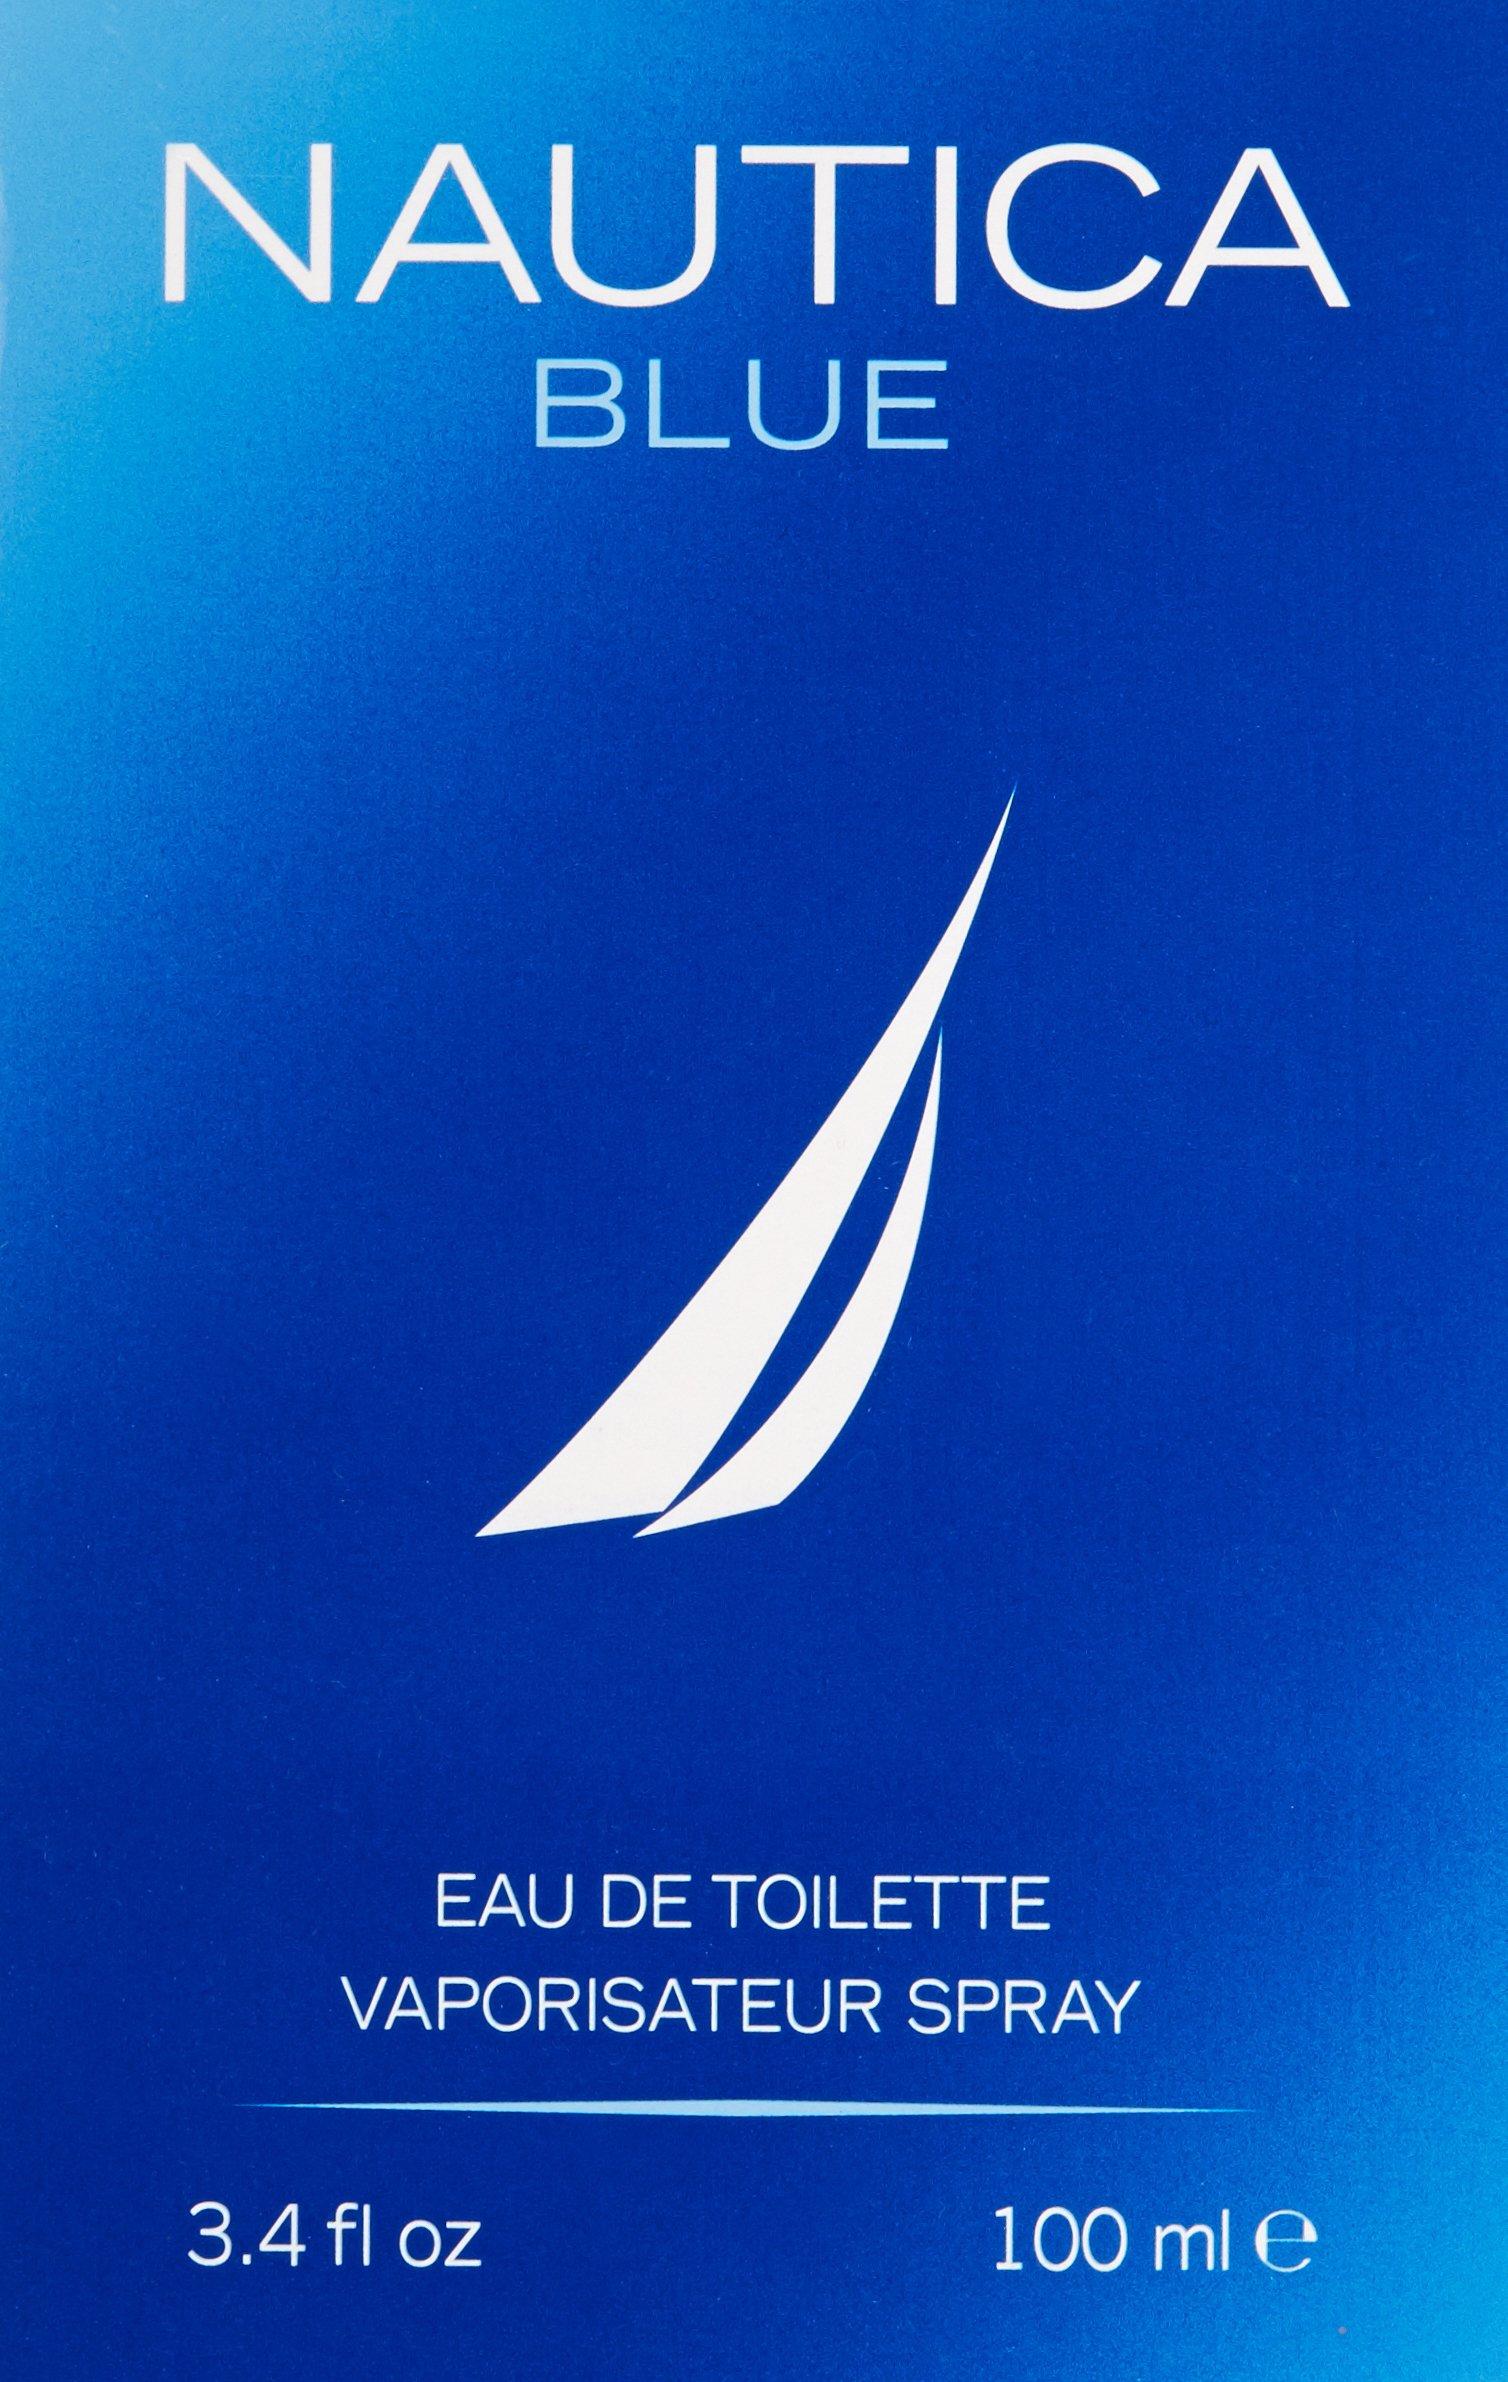 Nautica Blue Eau De Toilette Spray for Men, 3.4 fluid ounce by Nautica (Image #3)